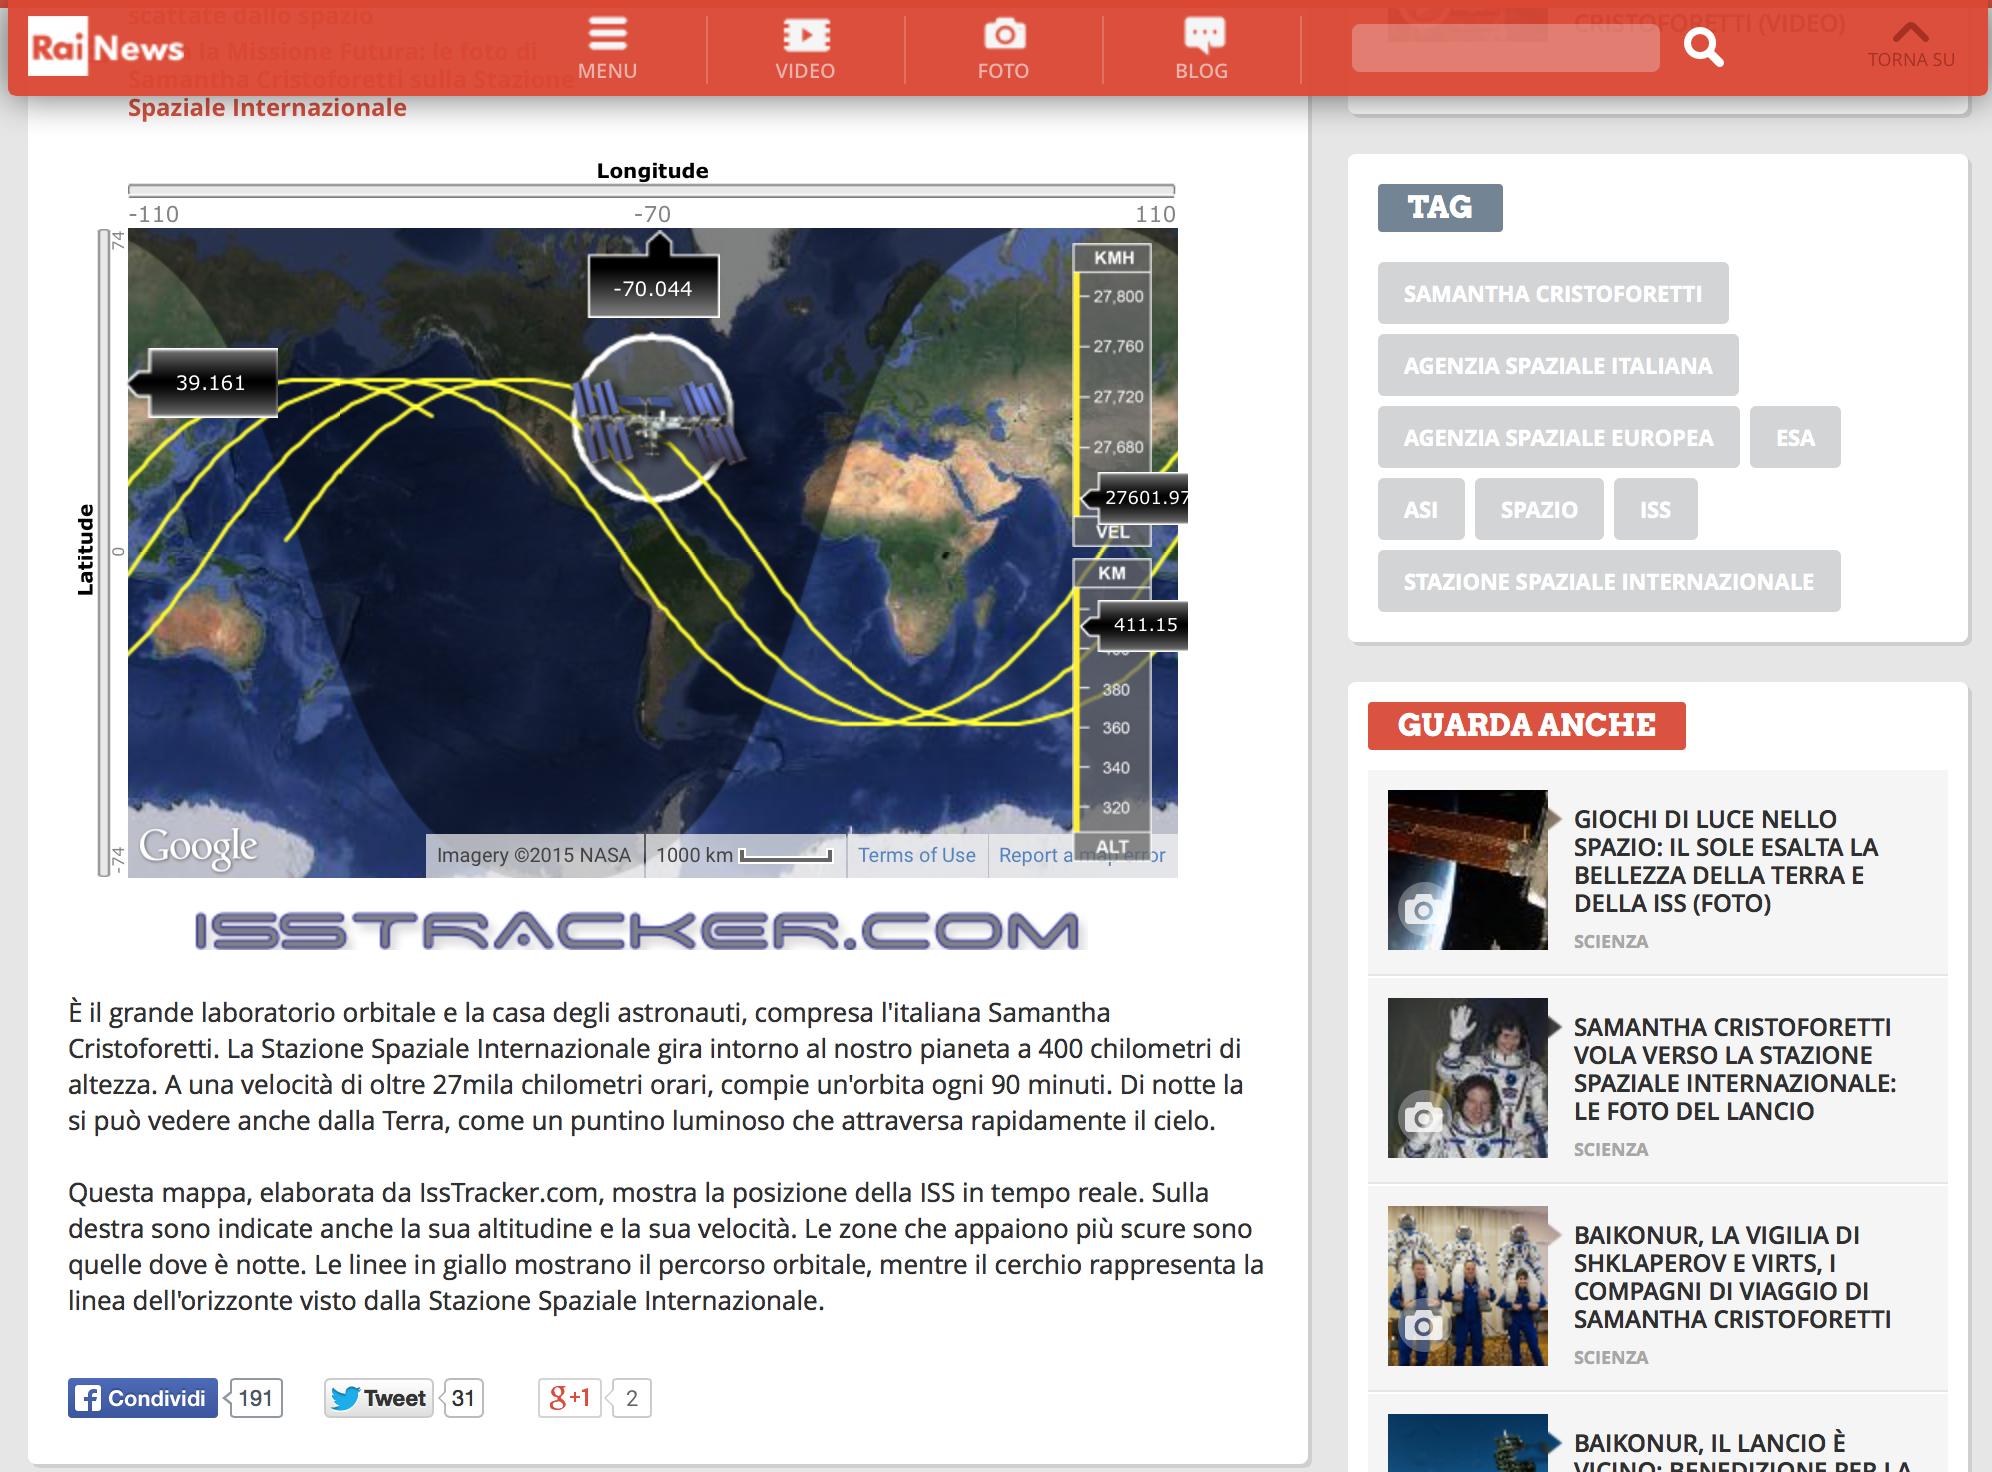 RaiNews: Embeddable ISS Tracker